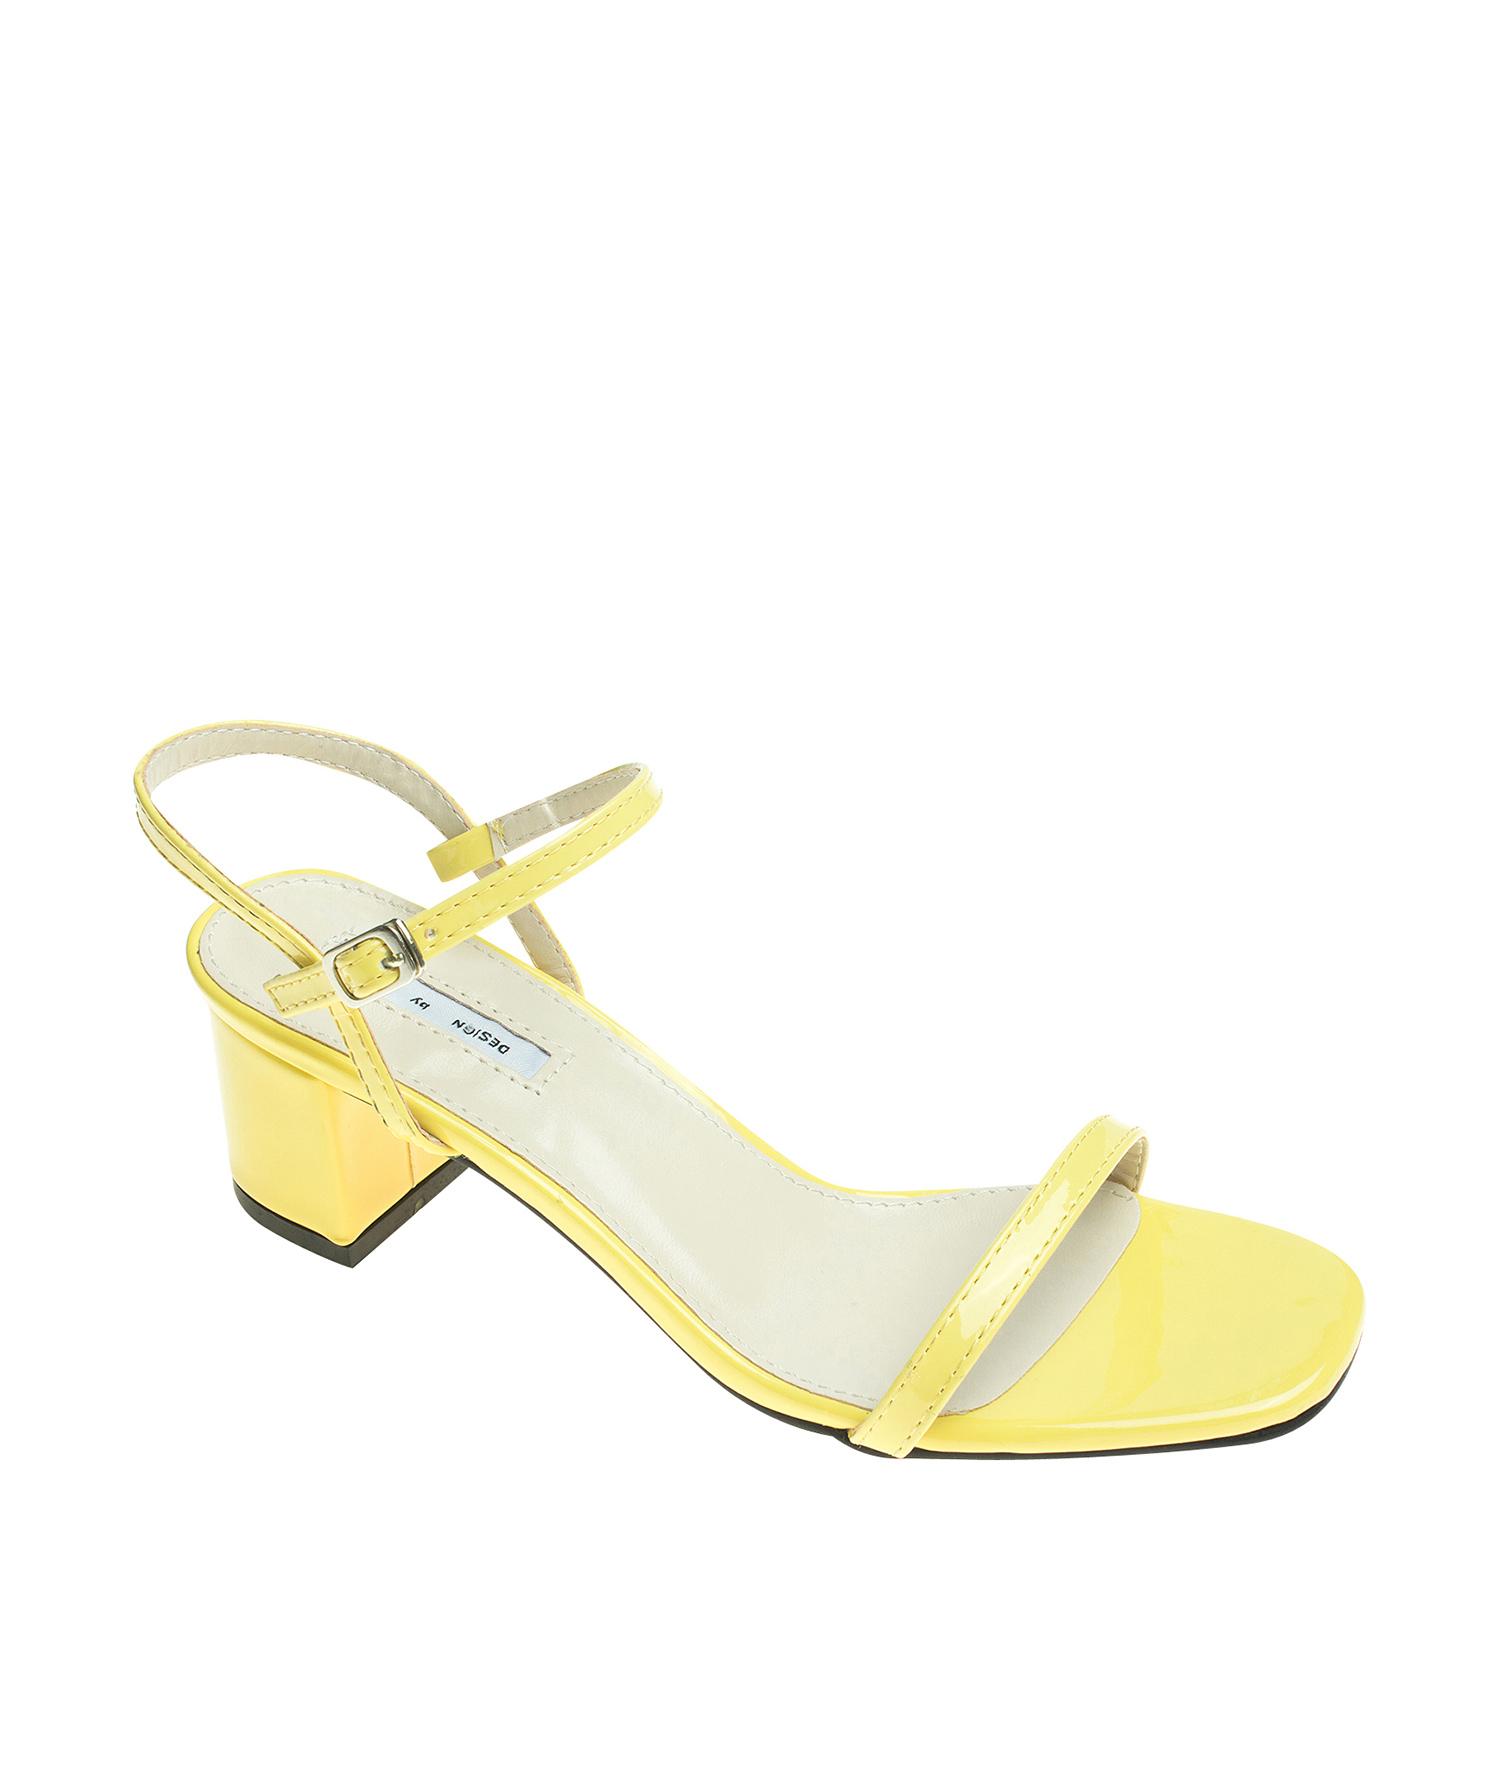 c2eaf913cc2 AnnaKastle Womens Patent Ankle Strap Block Heel Sandals Yellow